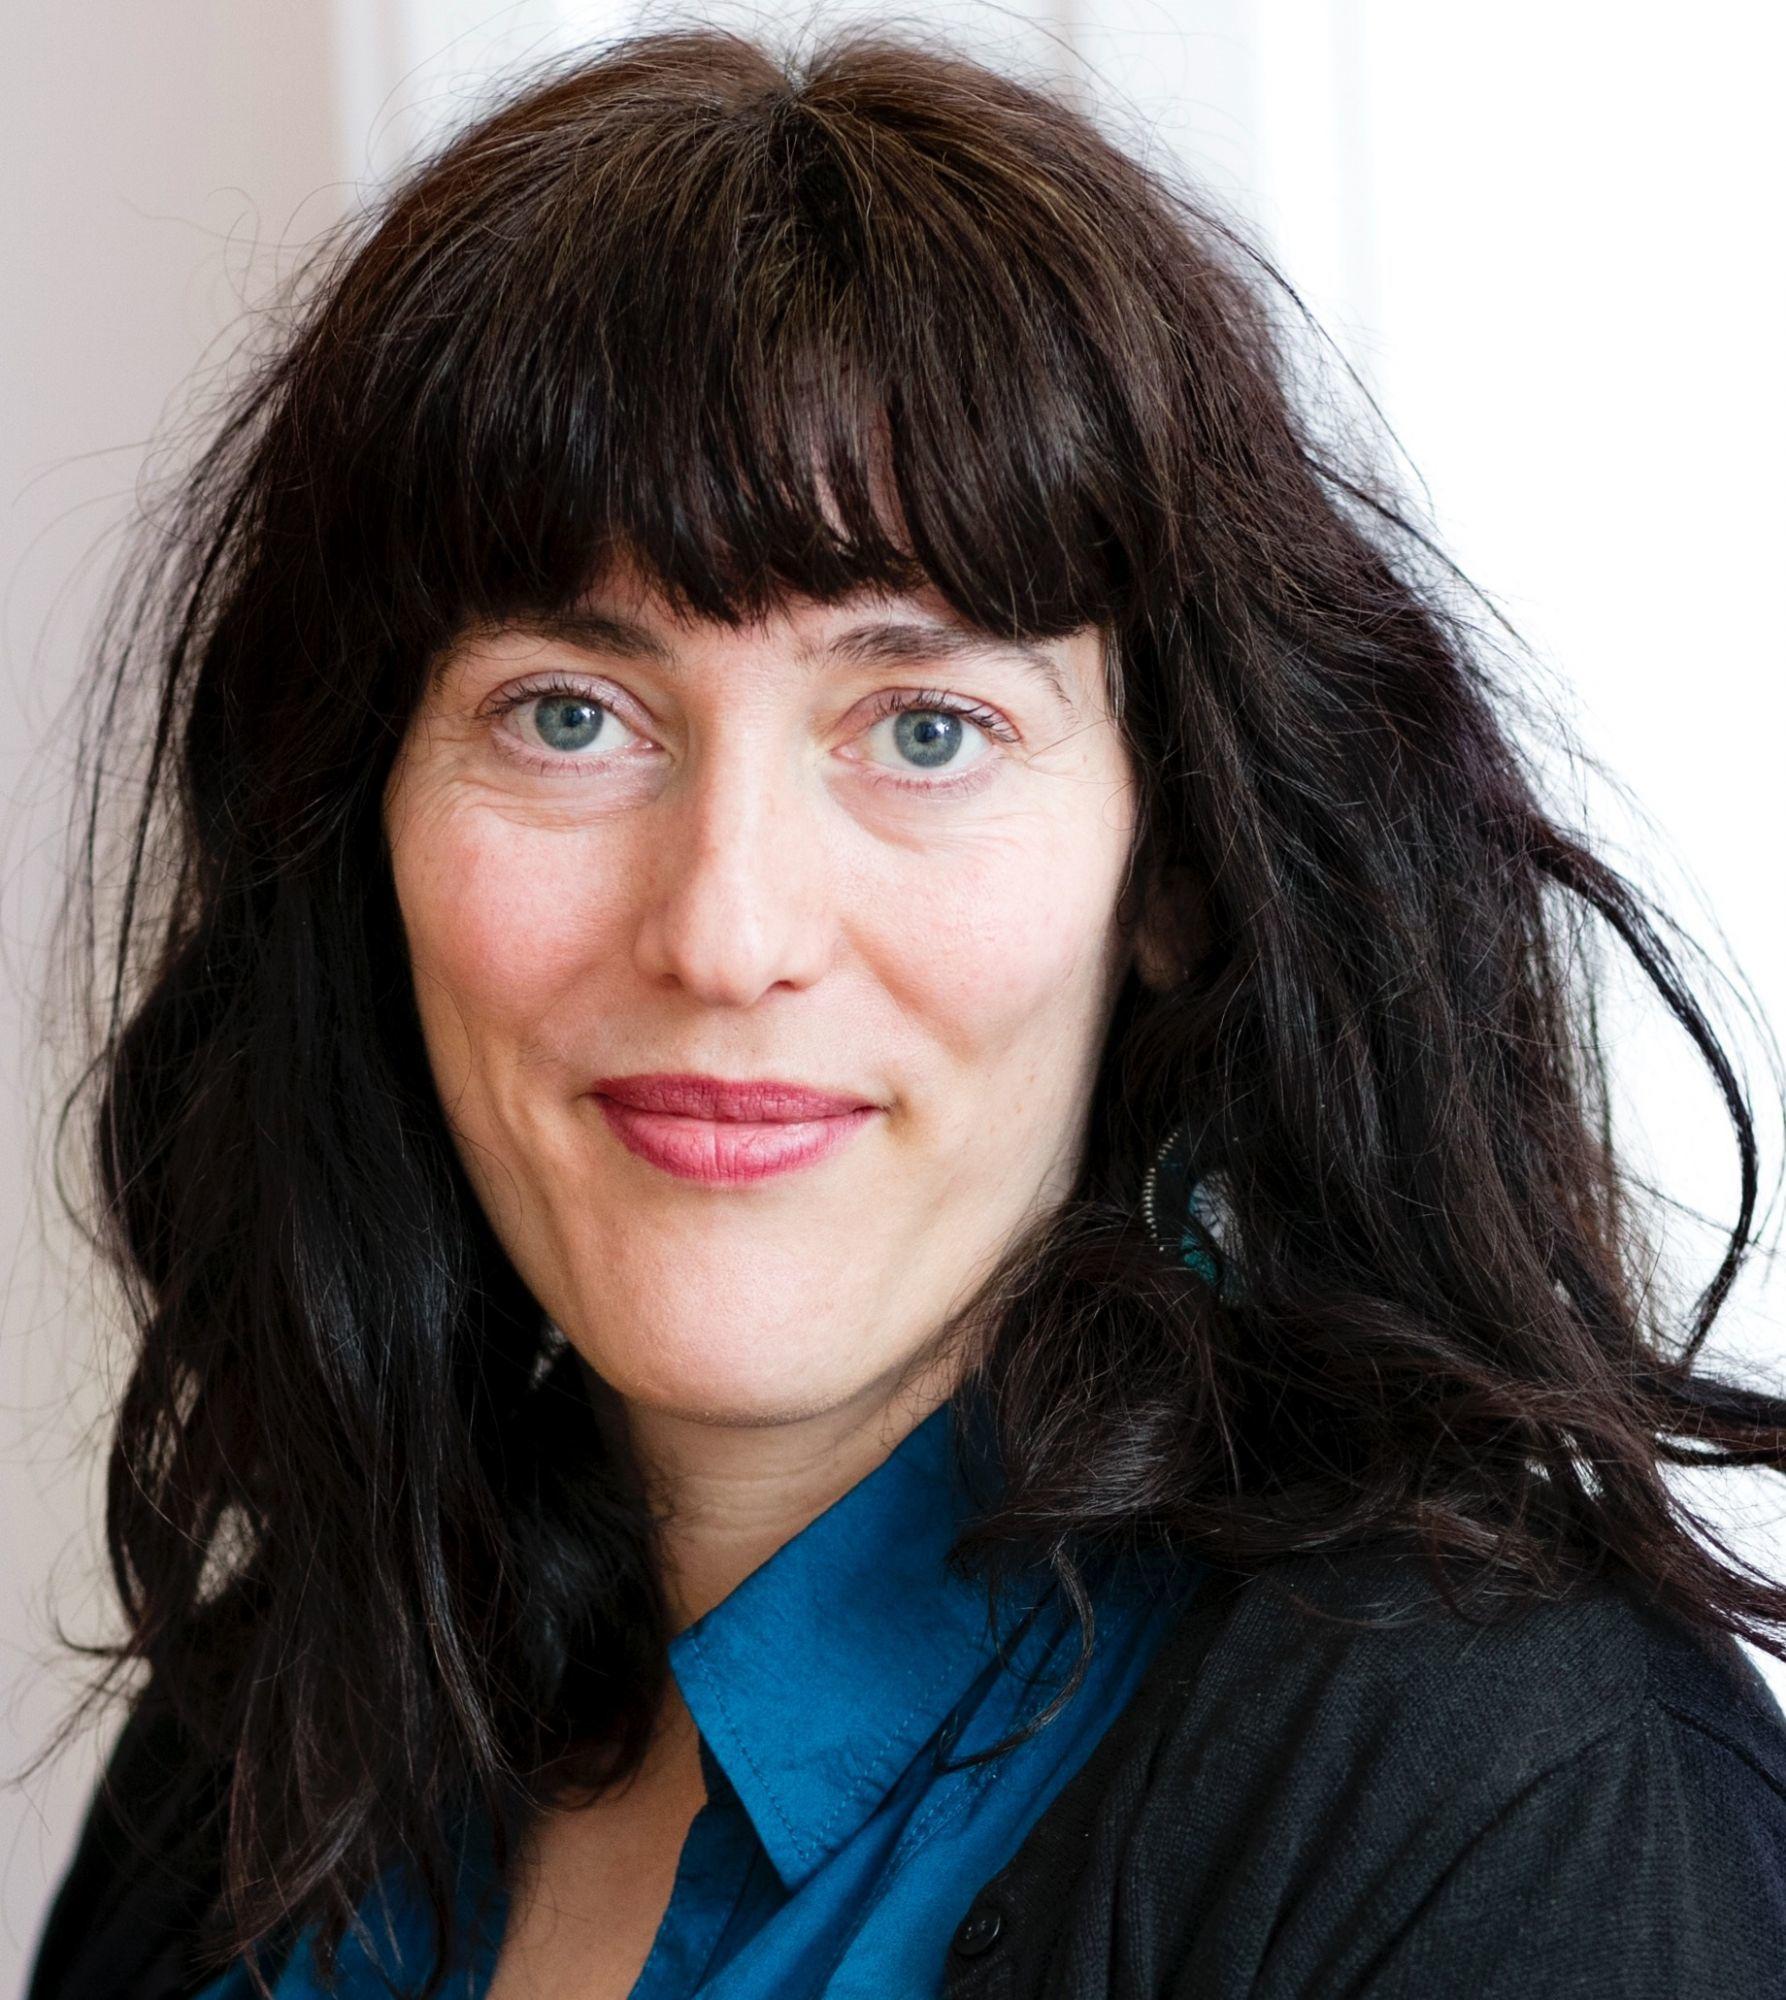 Mentee Maite Garcia Lechner, zakelijk leider bij theatergezelschap Ulrike Quade Company